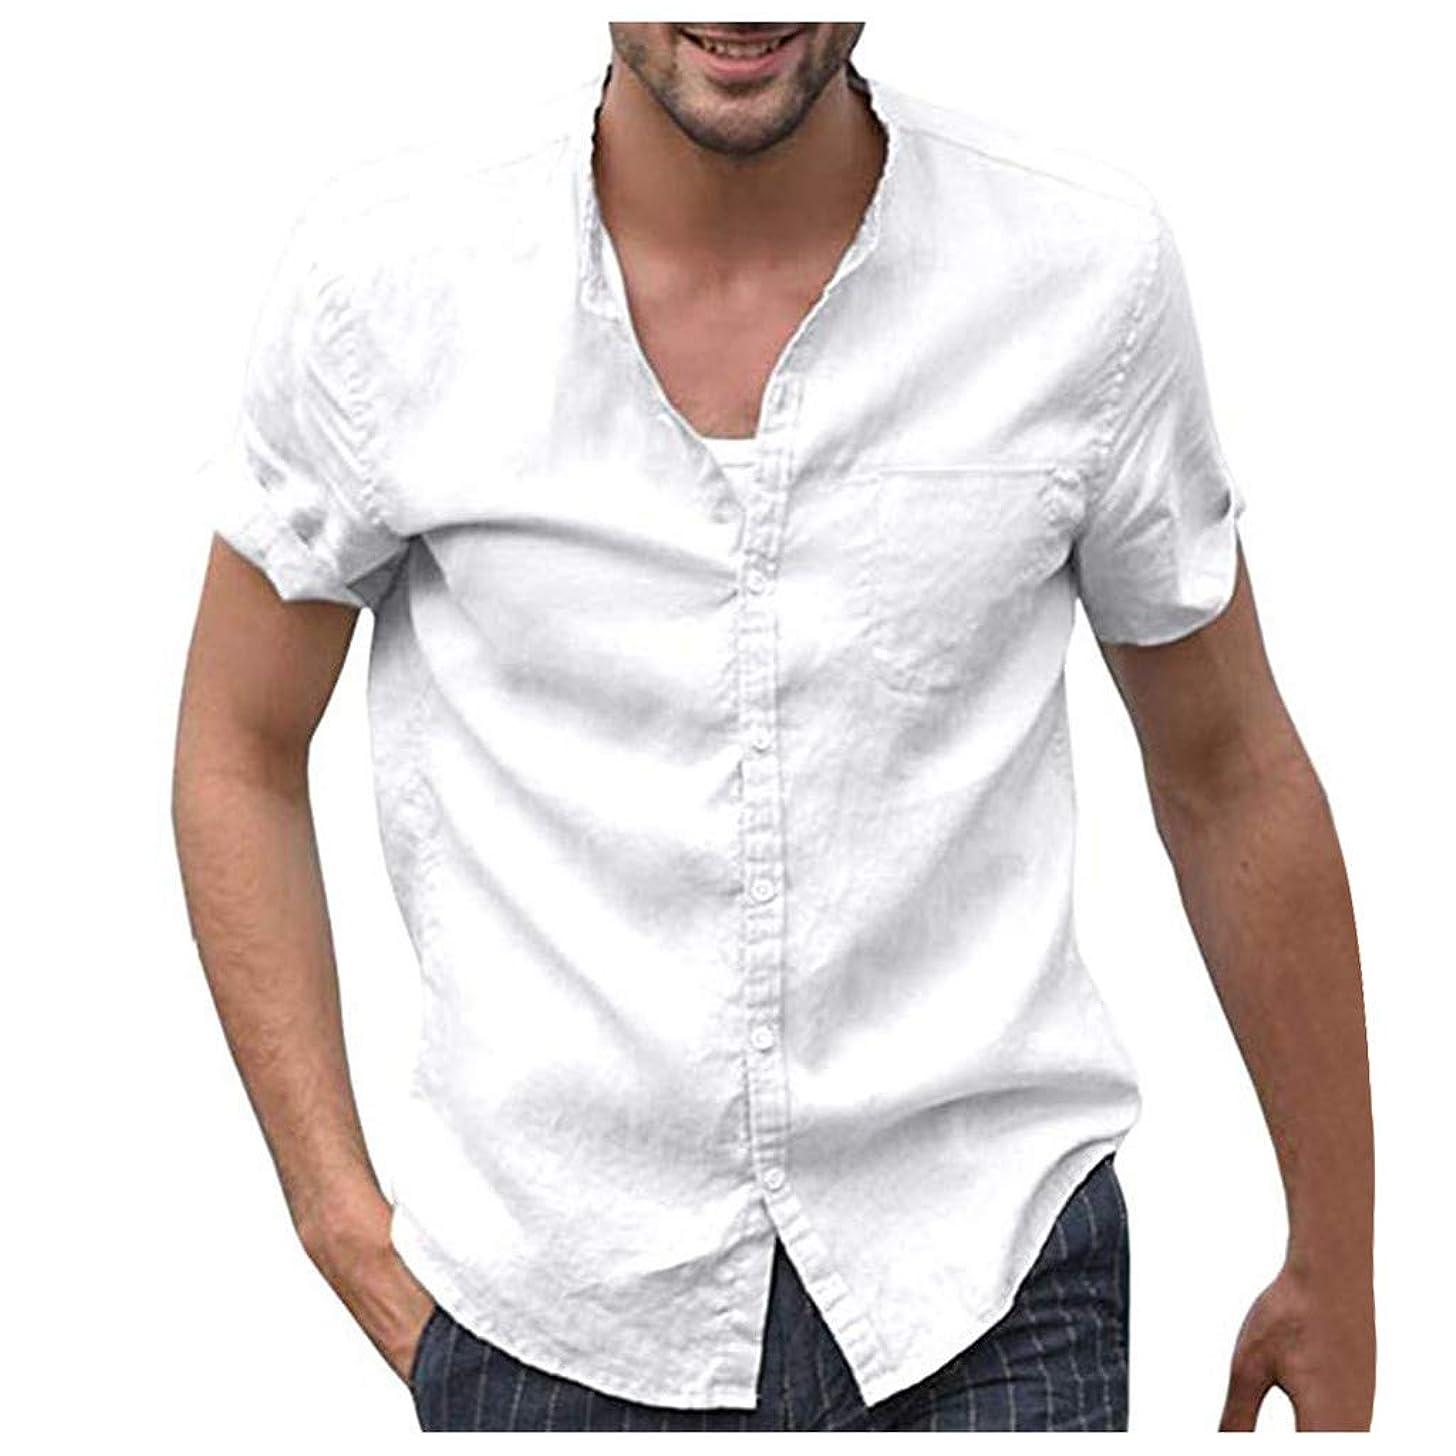 T Shirt For Men Nuewofally Loose Plus Size Short Sleeve T-Shirt Baggy Cotton Linen Henley Shirts Button Retro Tee Tops (White,3XL)